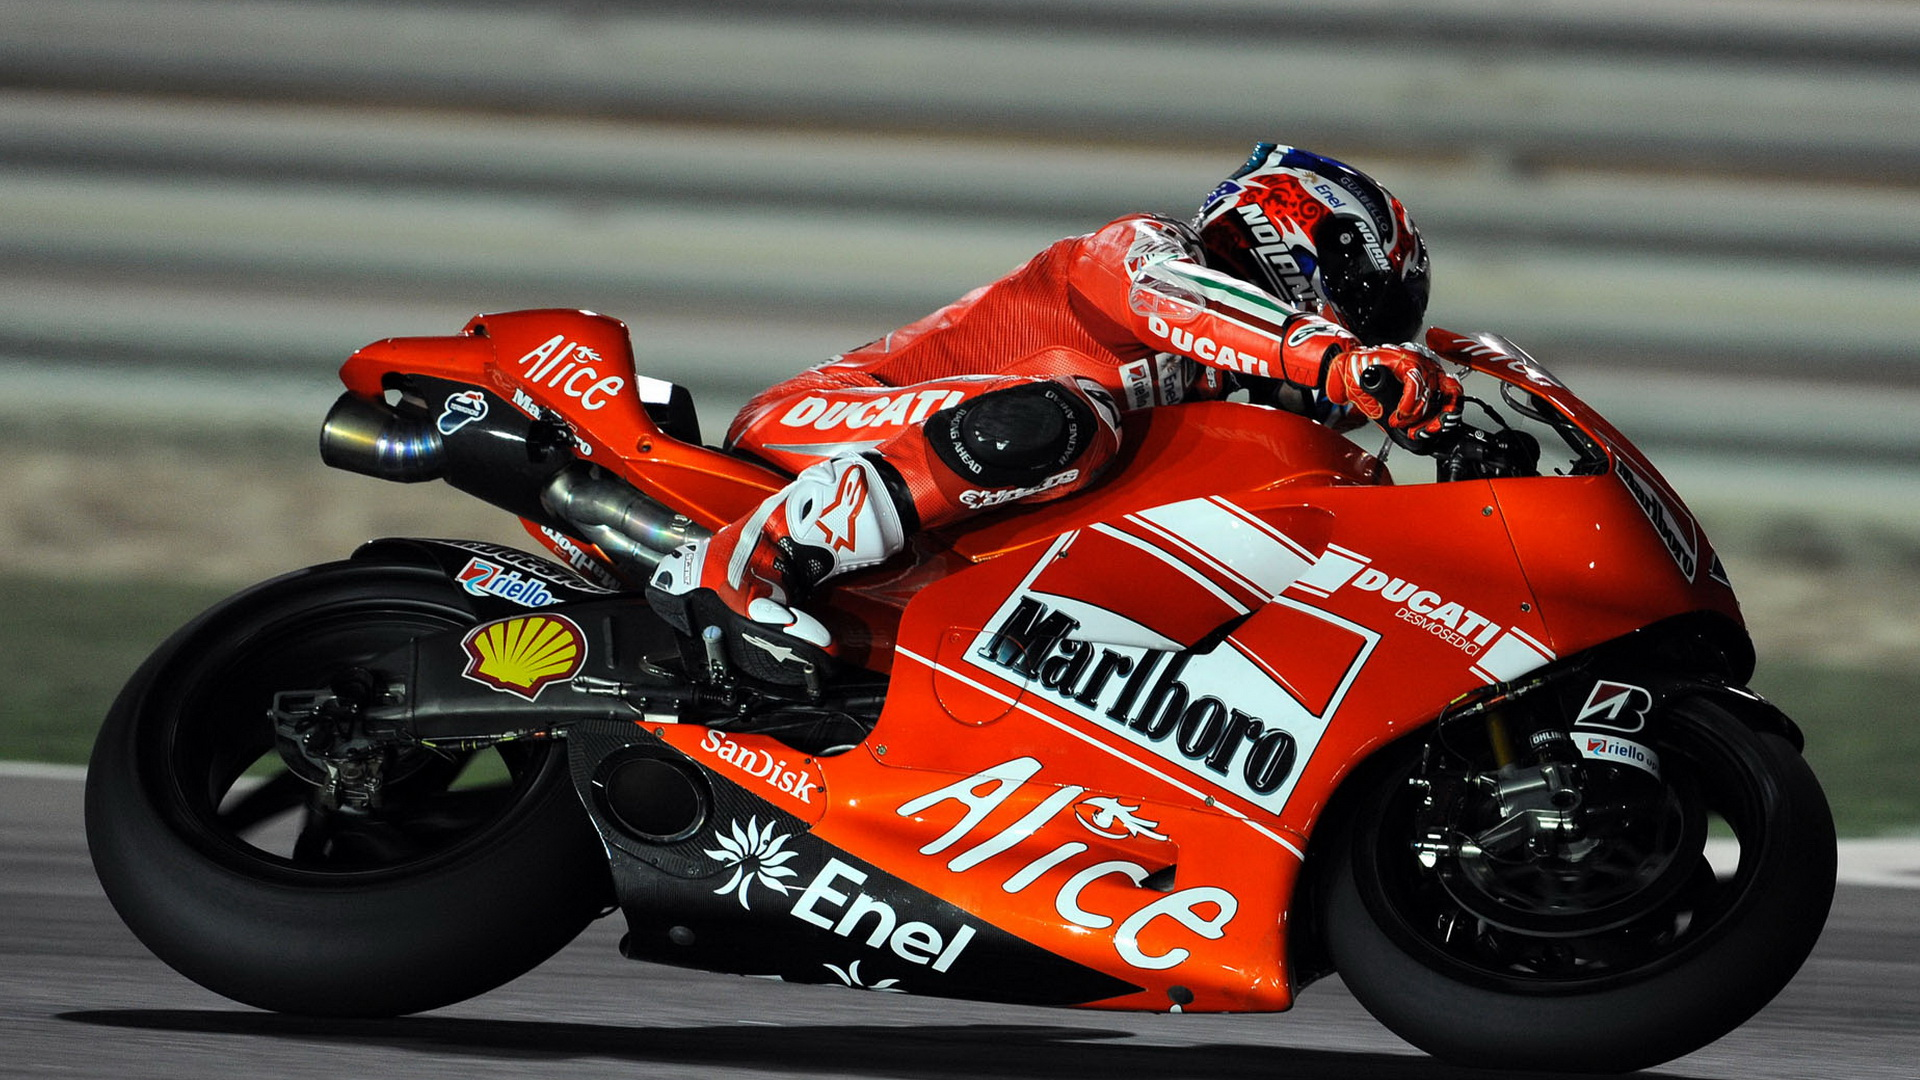 Moto Gp Ducati wallpaper   707015 1920x1080